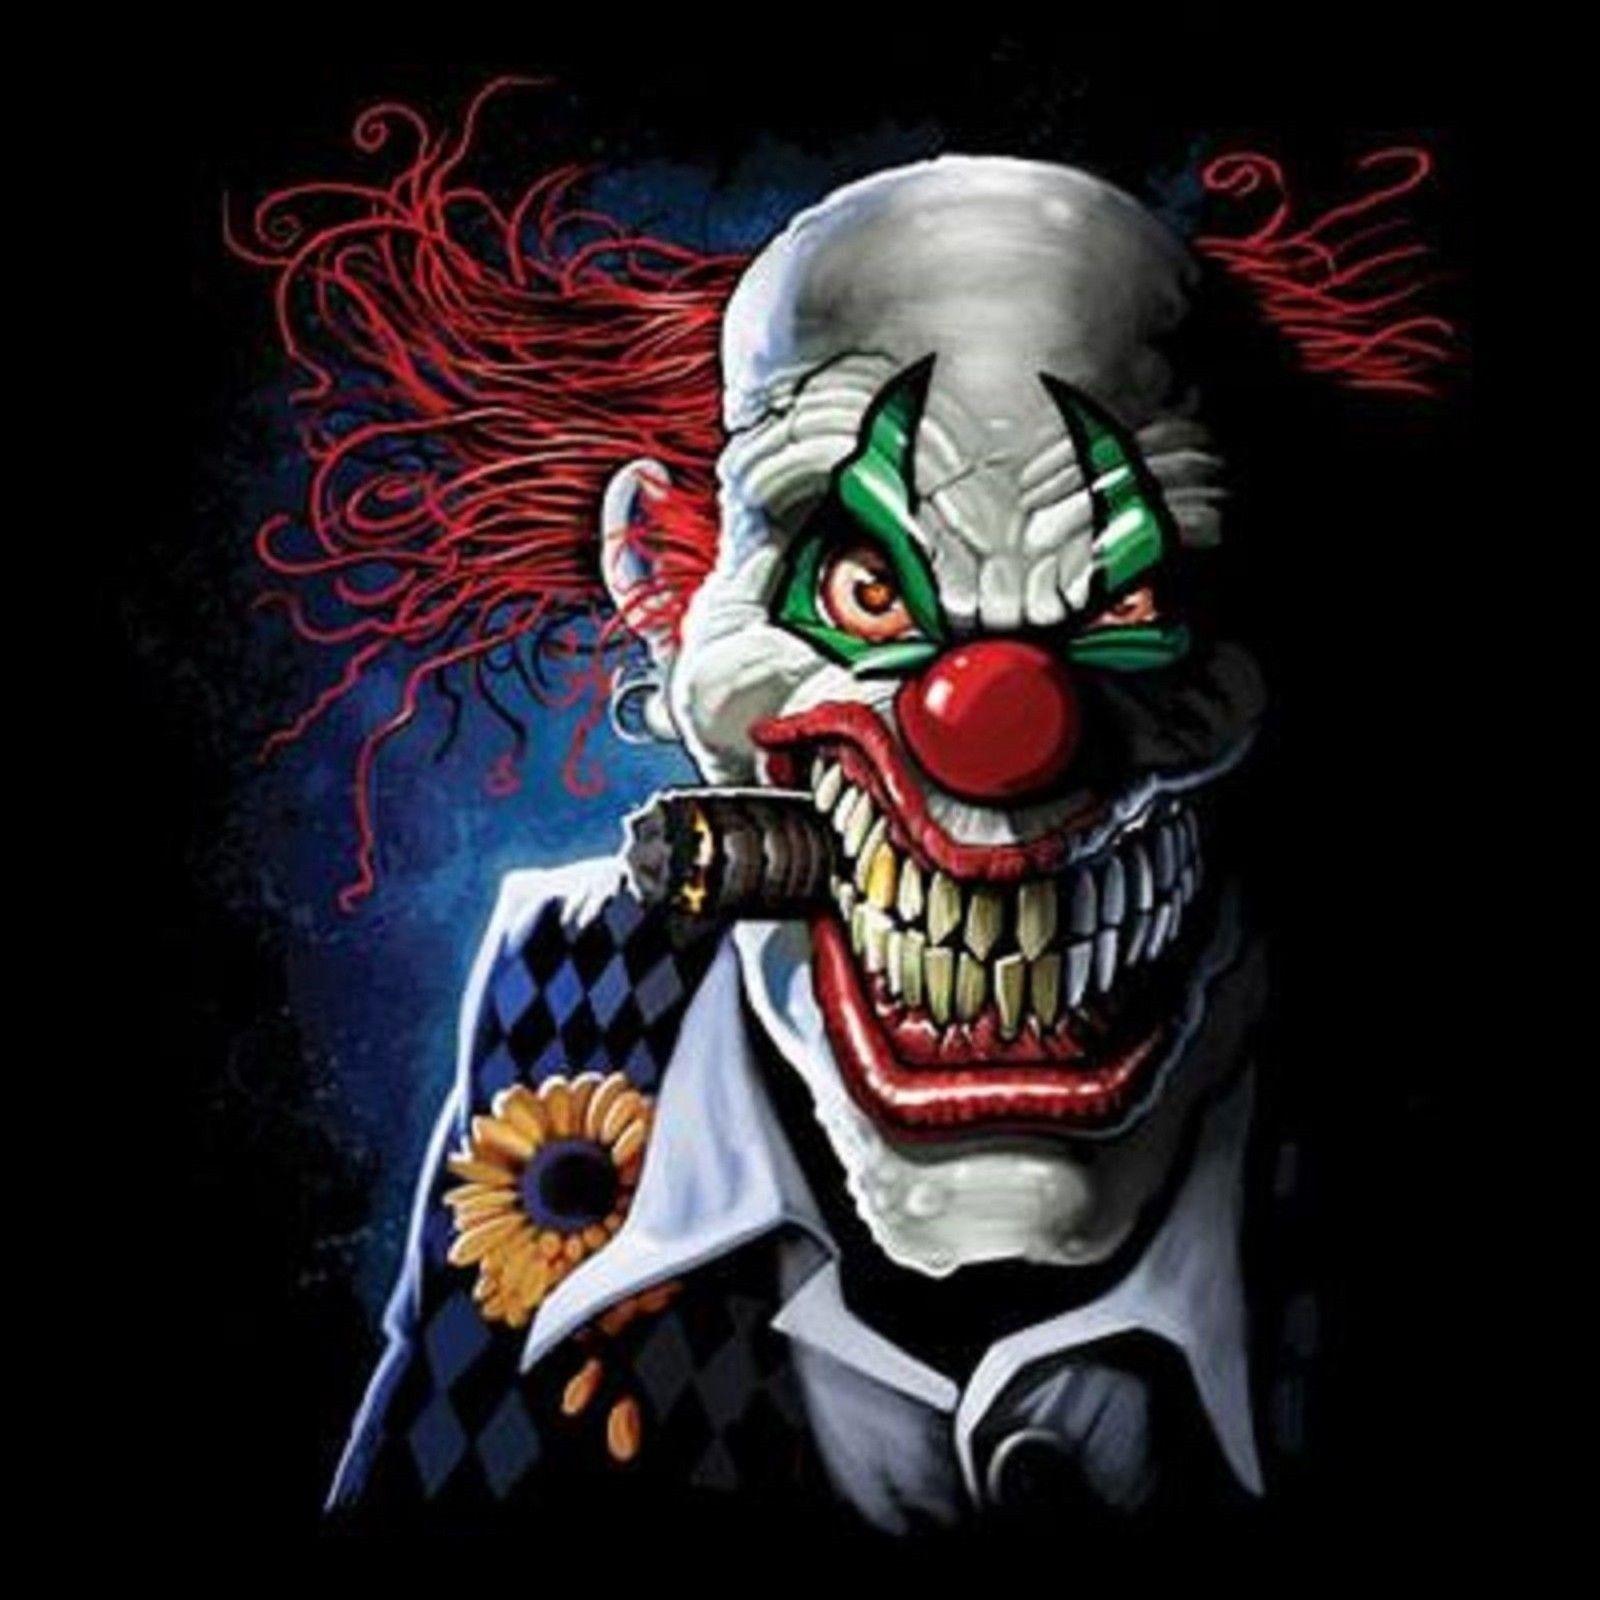 Joker Long Sleeve T Shirt Pick Your Size Ebay Scary Clown Face Scary Clowns Joker Clown